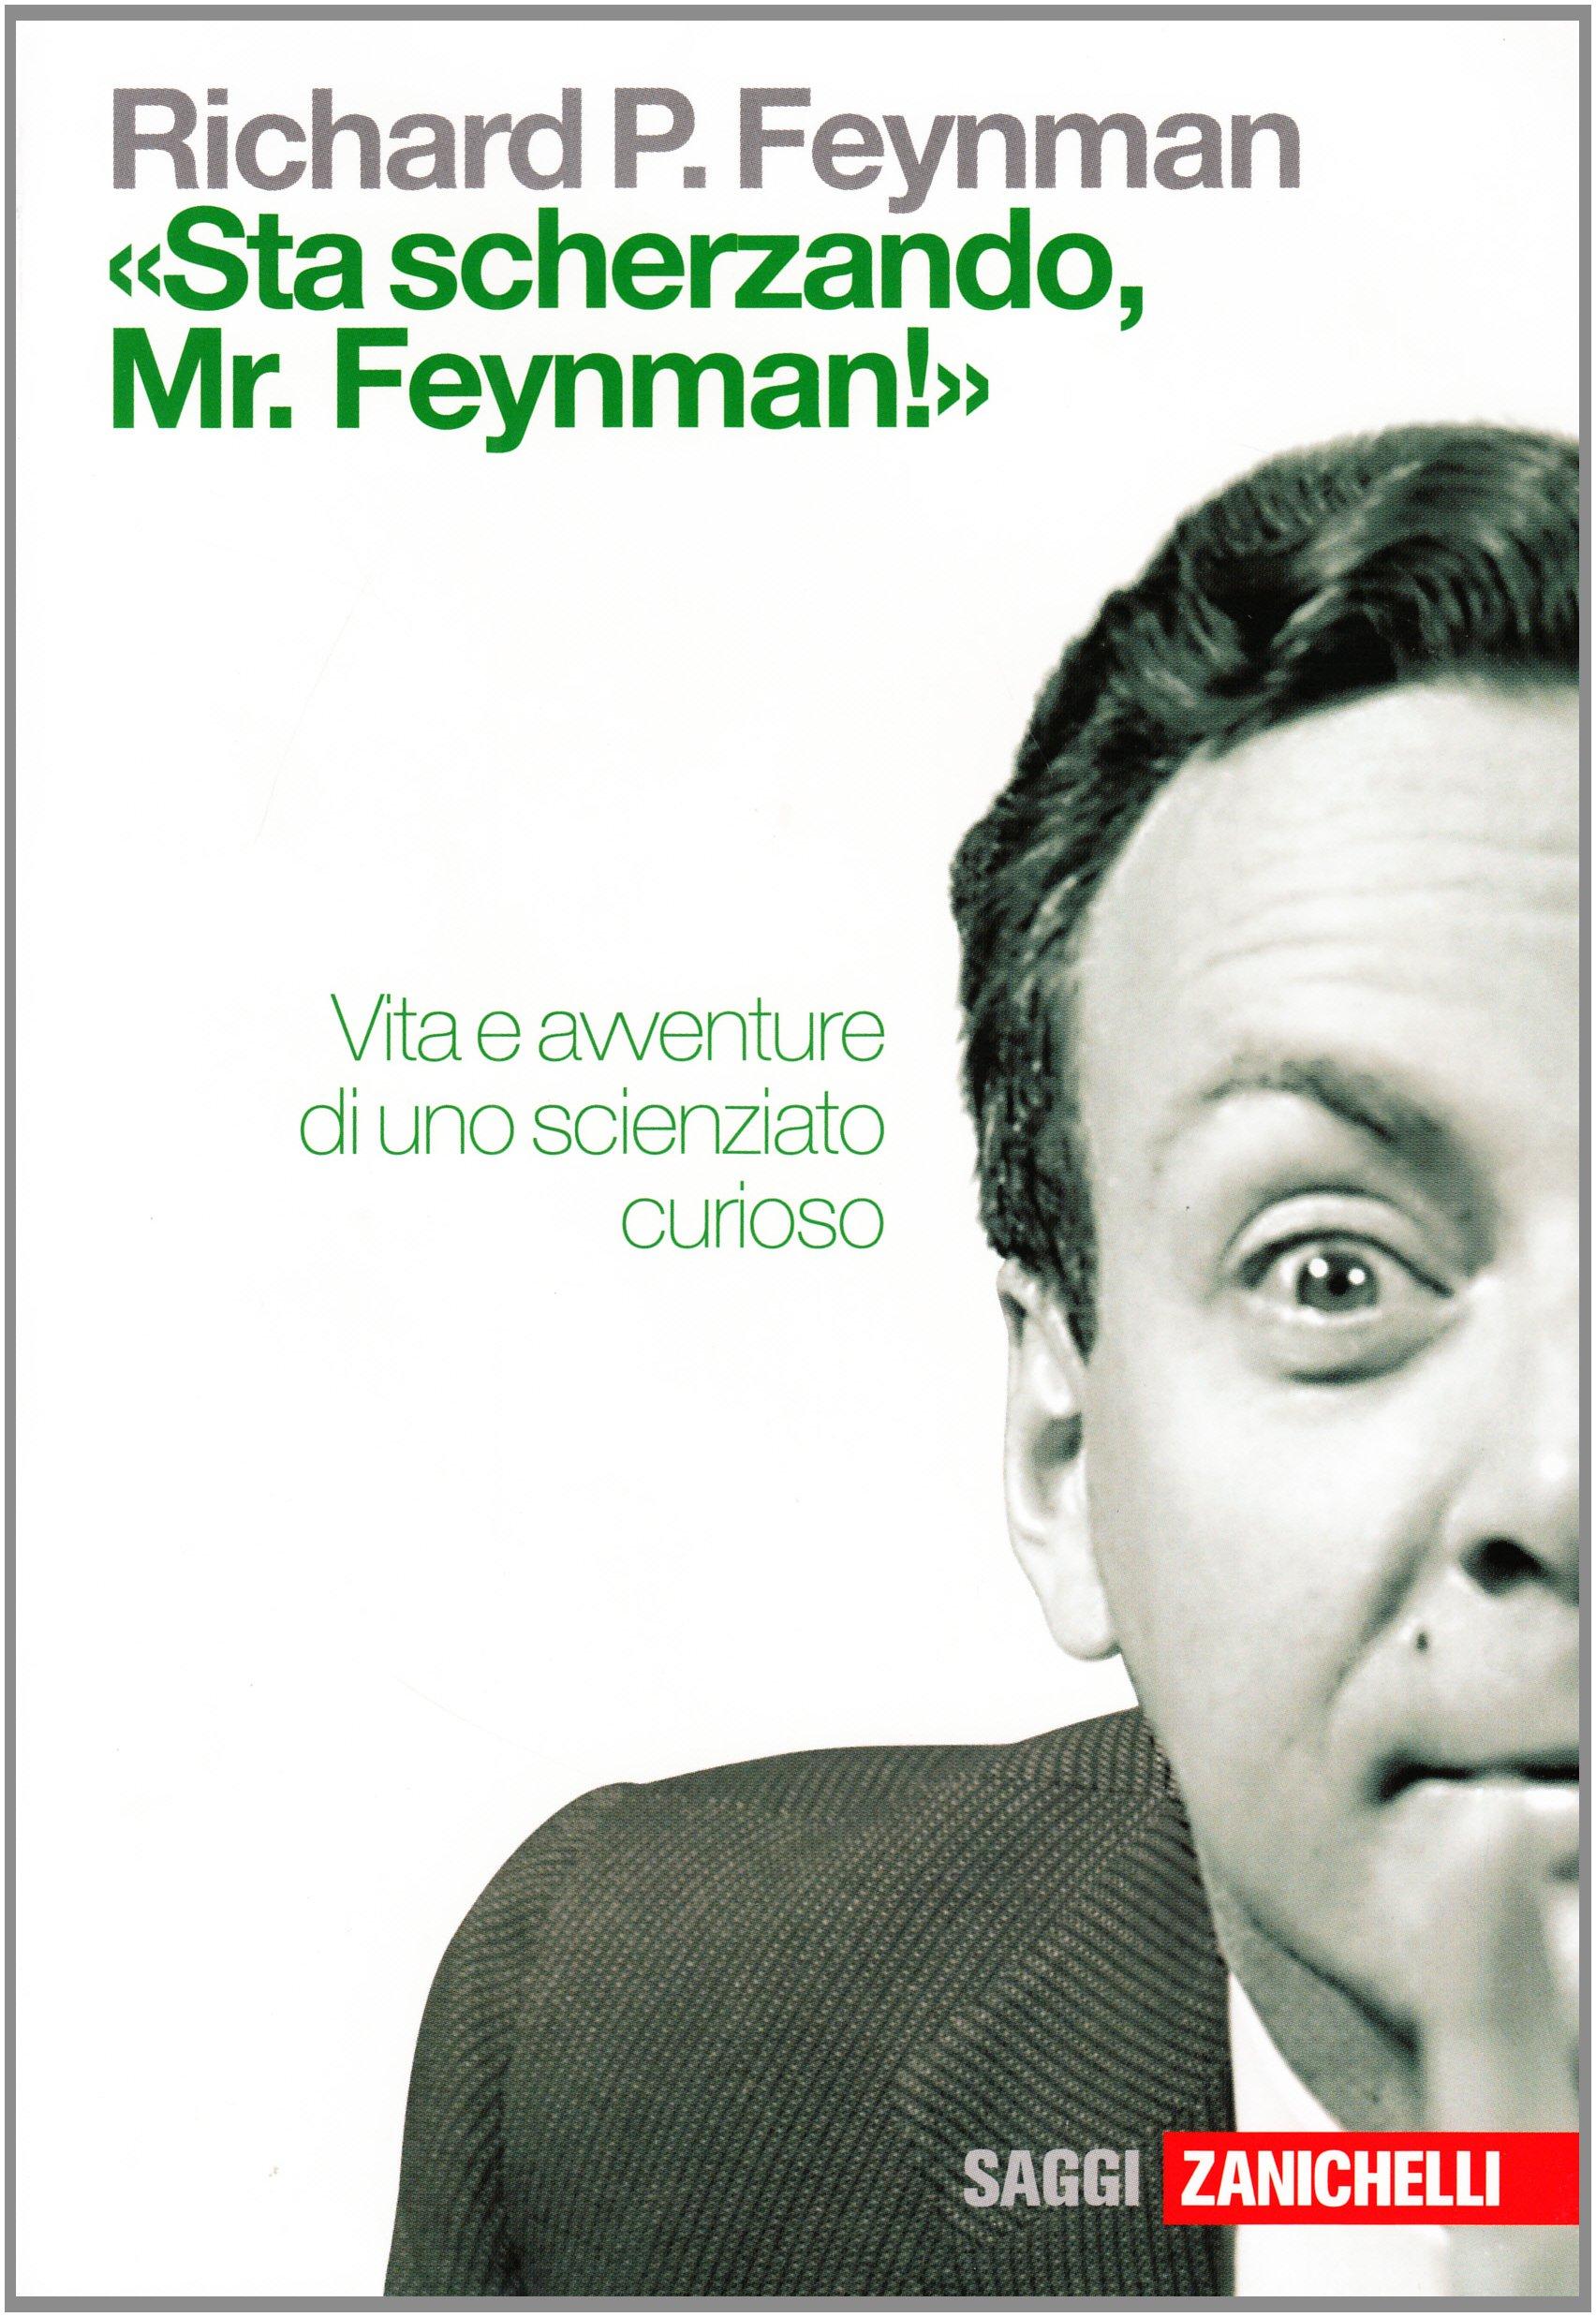 Copertina Libro «Sta scherzando Mr. Feynman!»